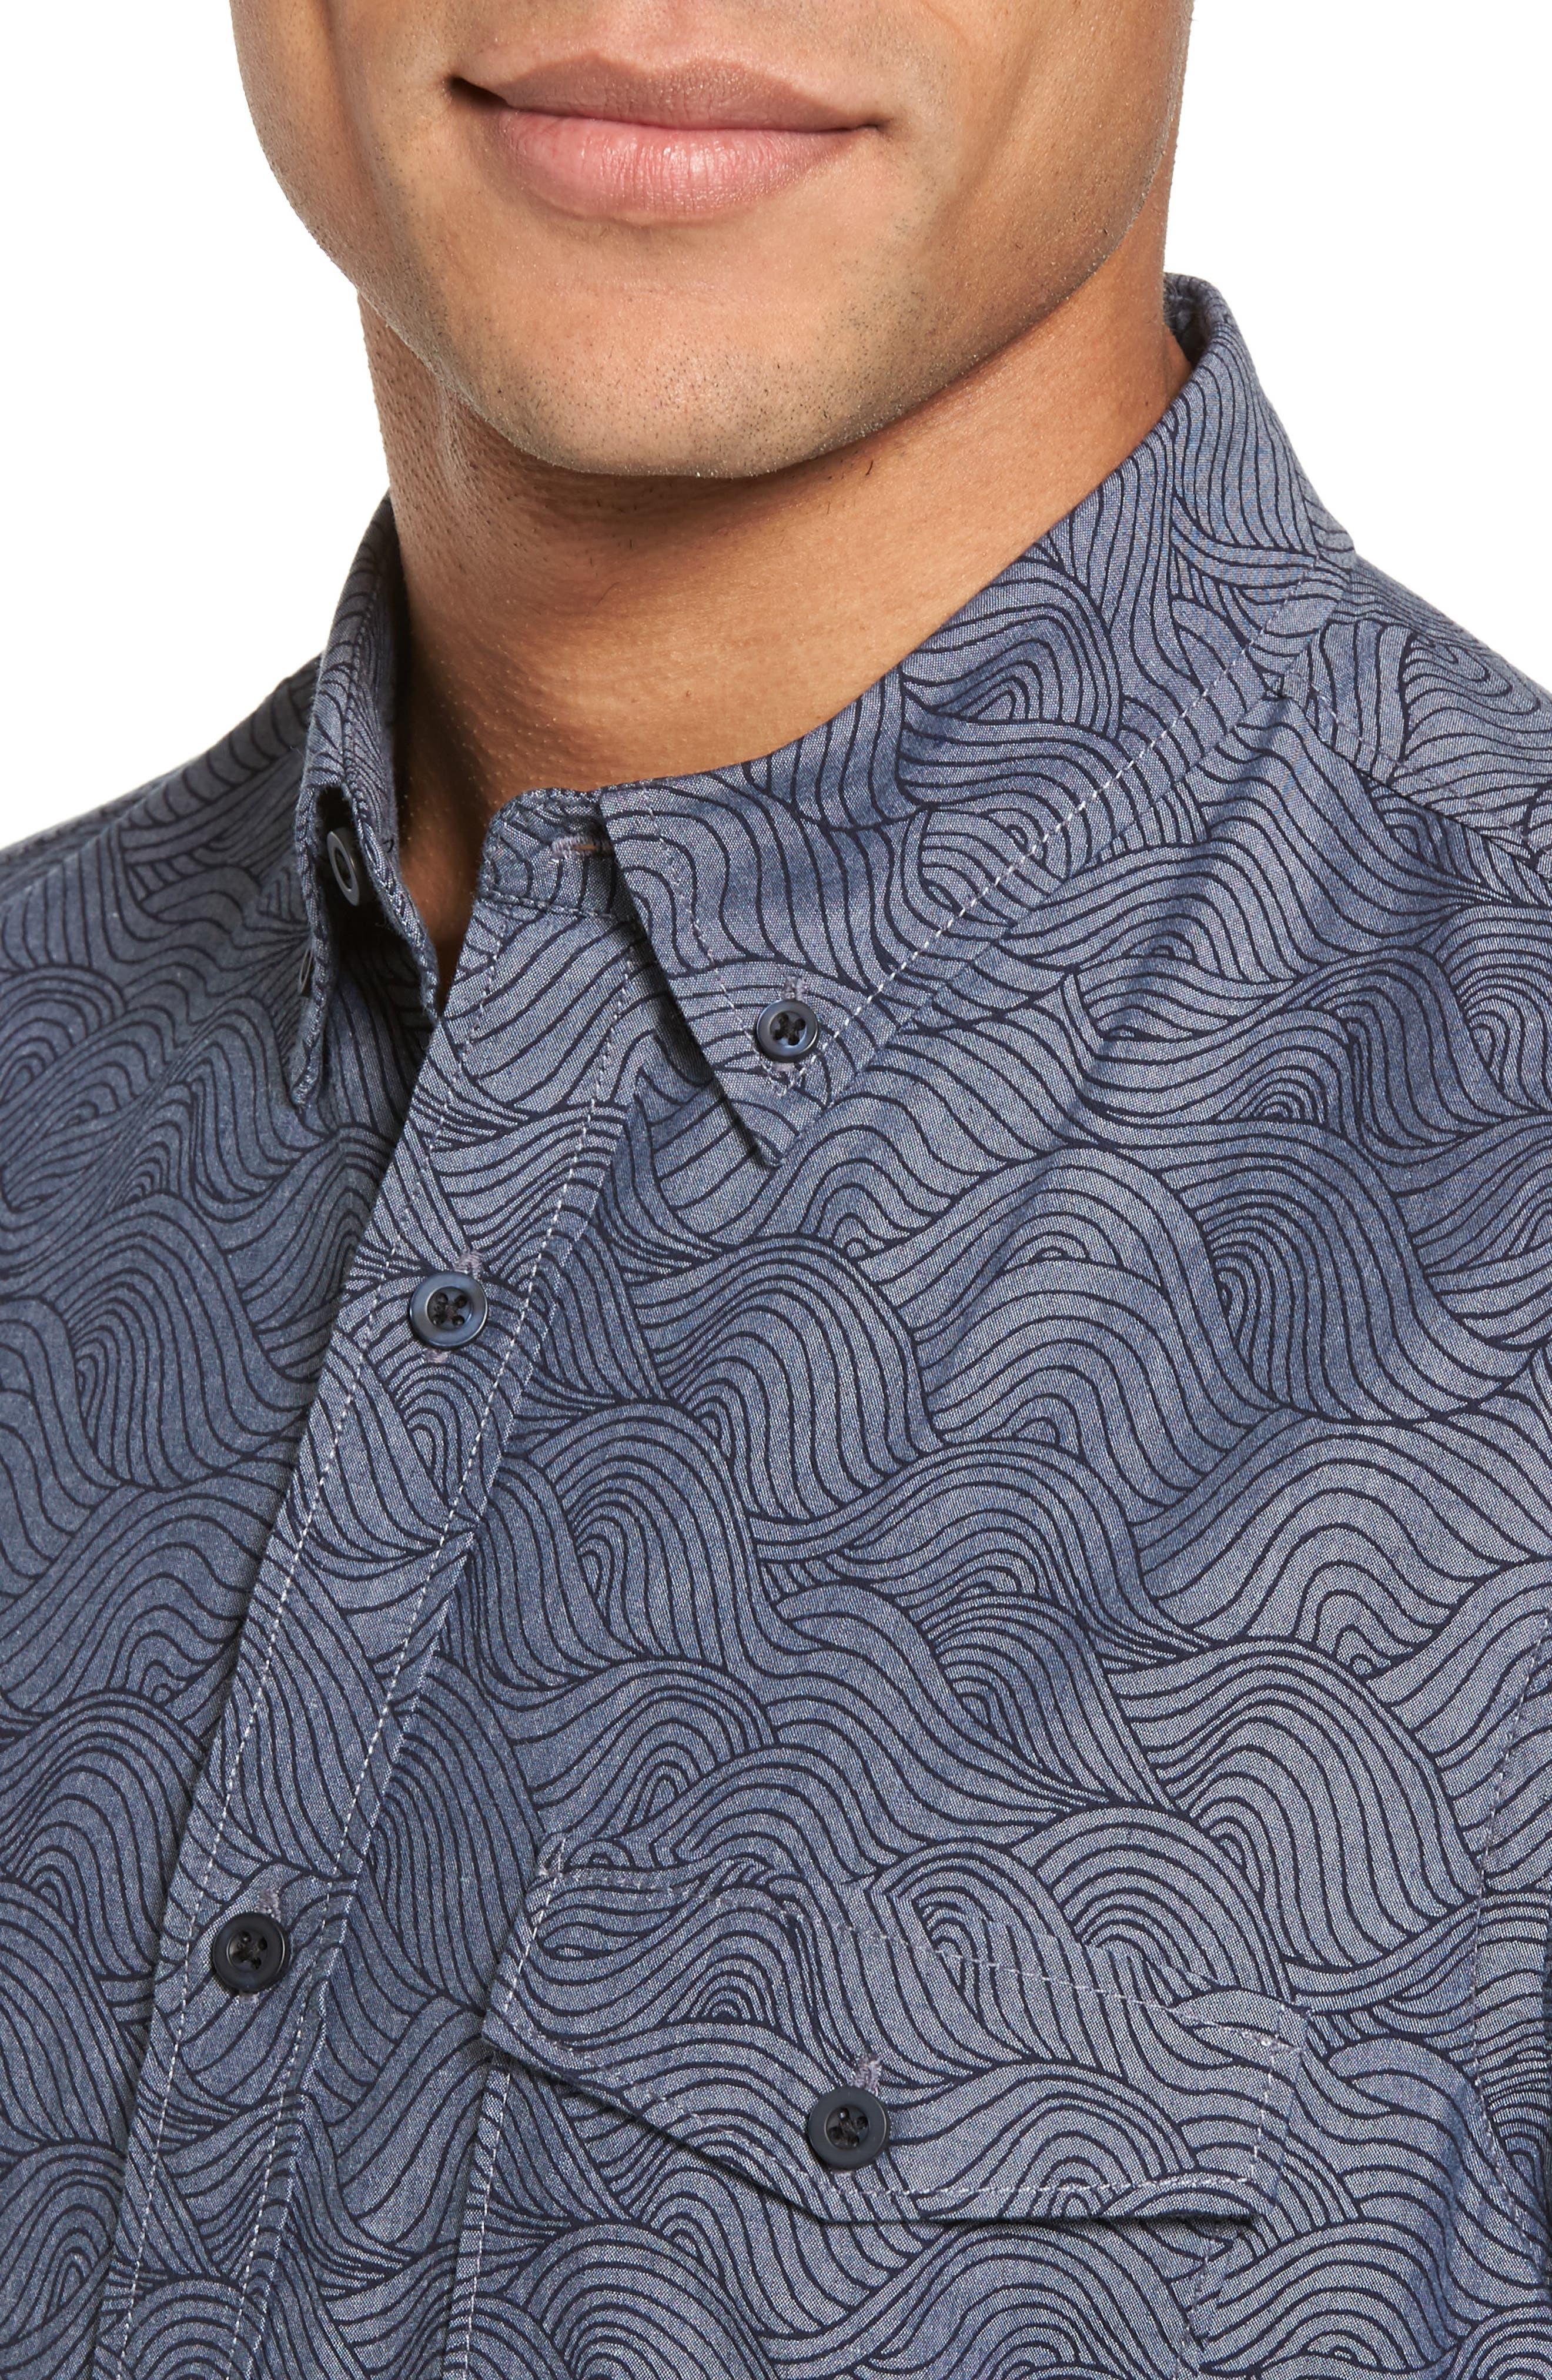 Trim Fit Ivy Print Sport Shirt,                             Alternate thumbnail 4, color,                             Grey Onyx Rolling Waves